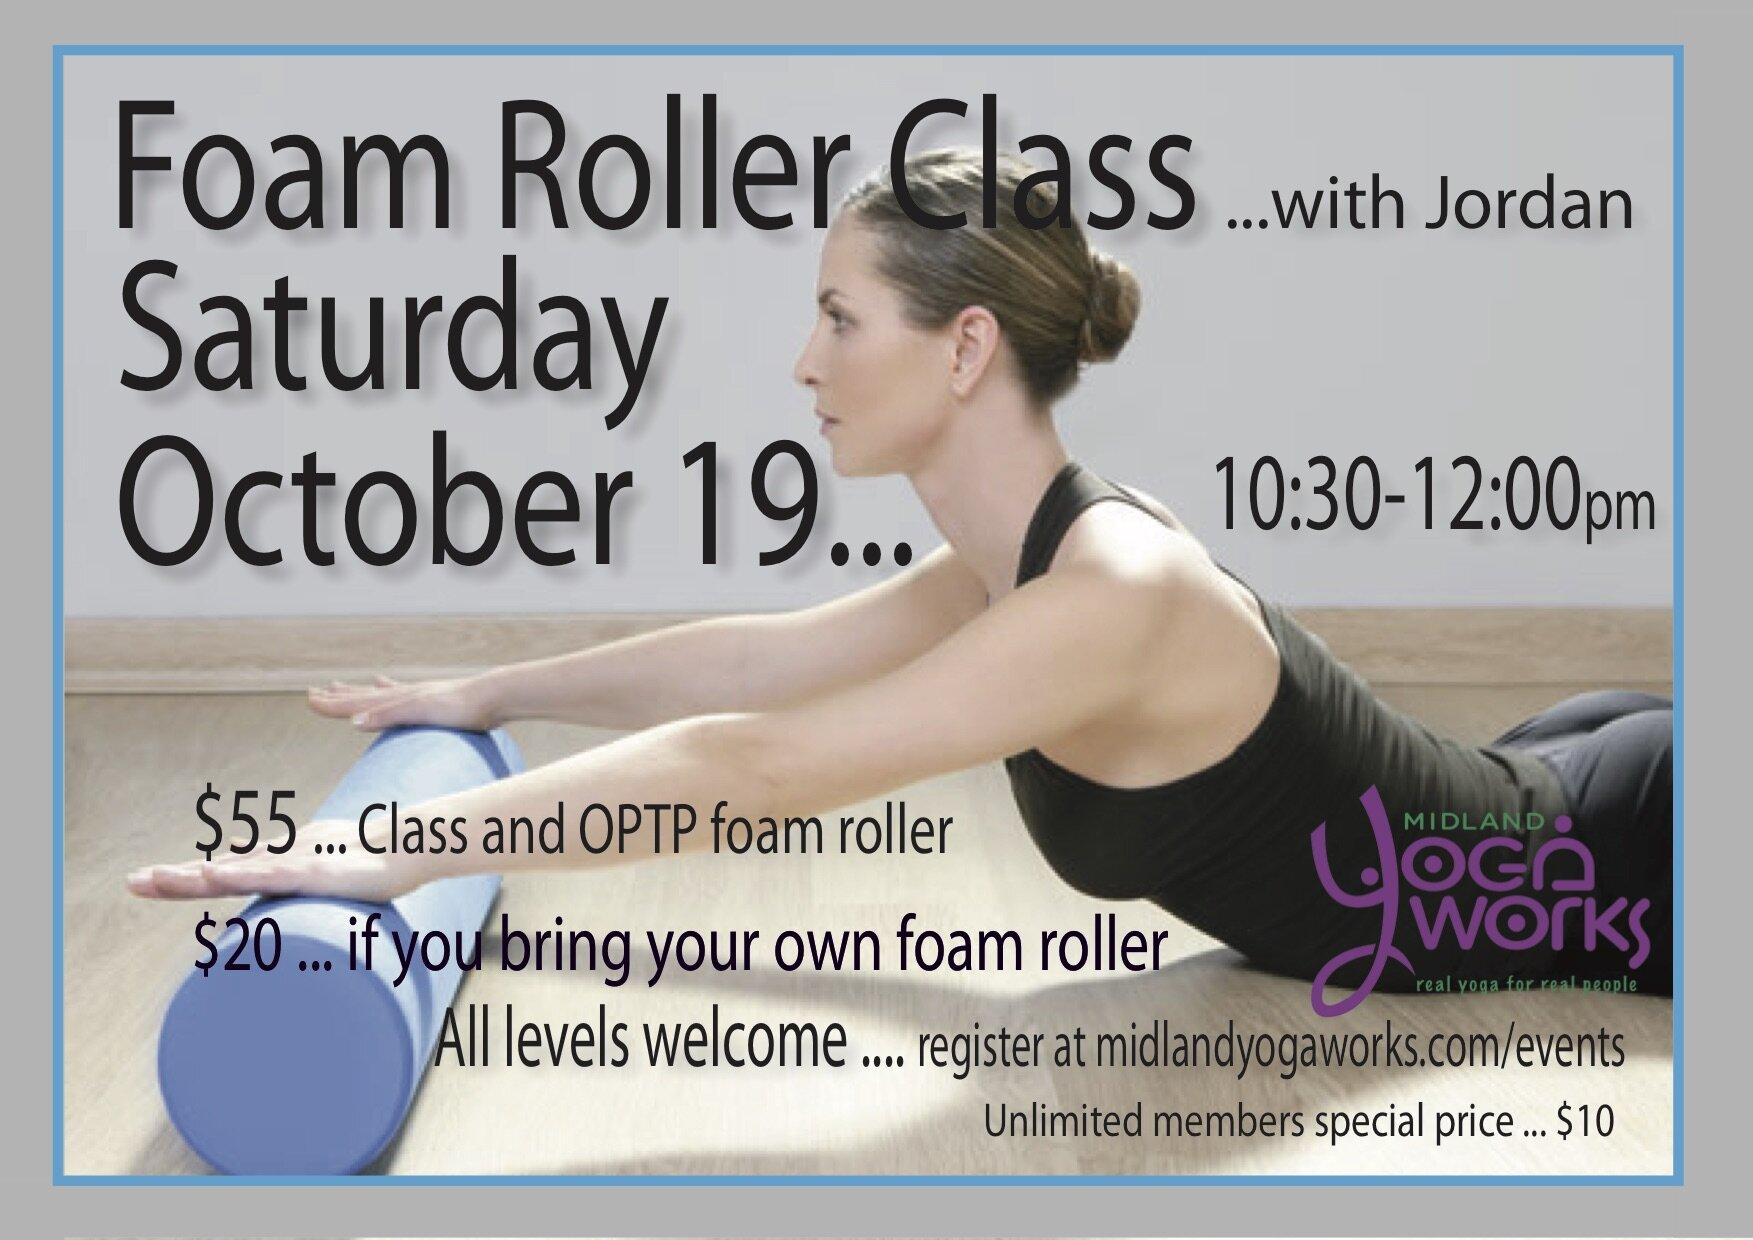 foam roller class for cyclist copy.jpg